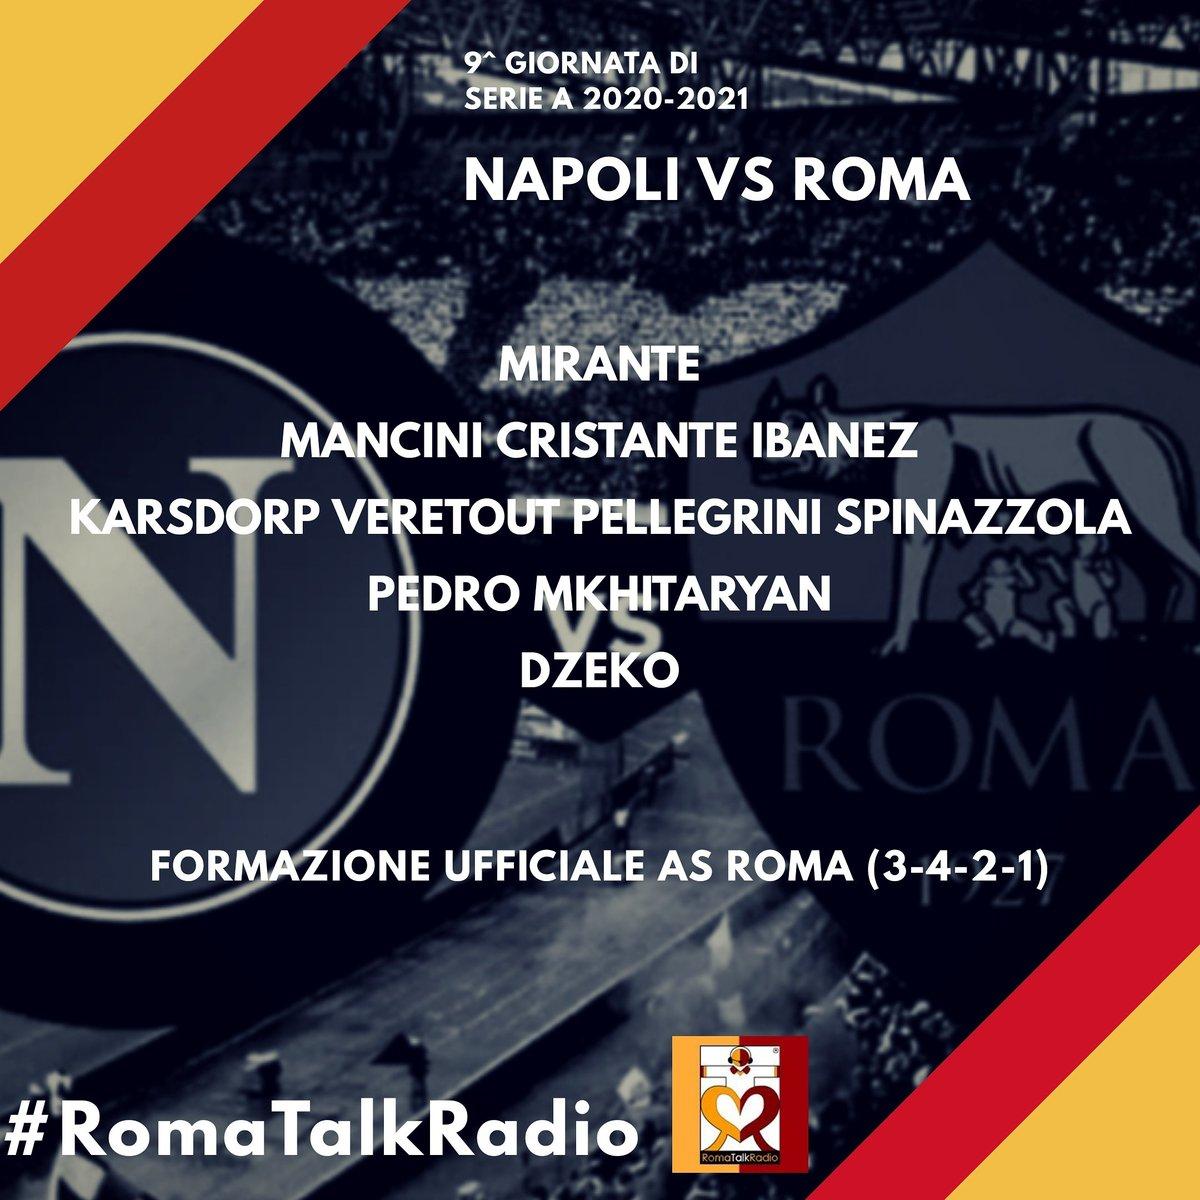 #NapoliRoma